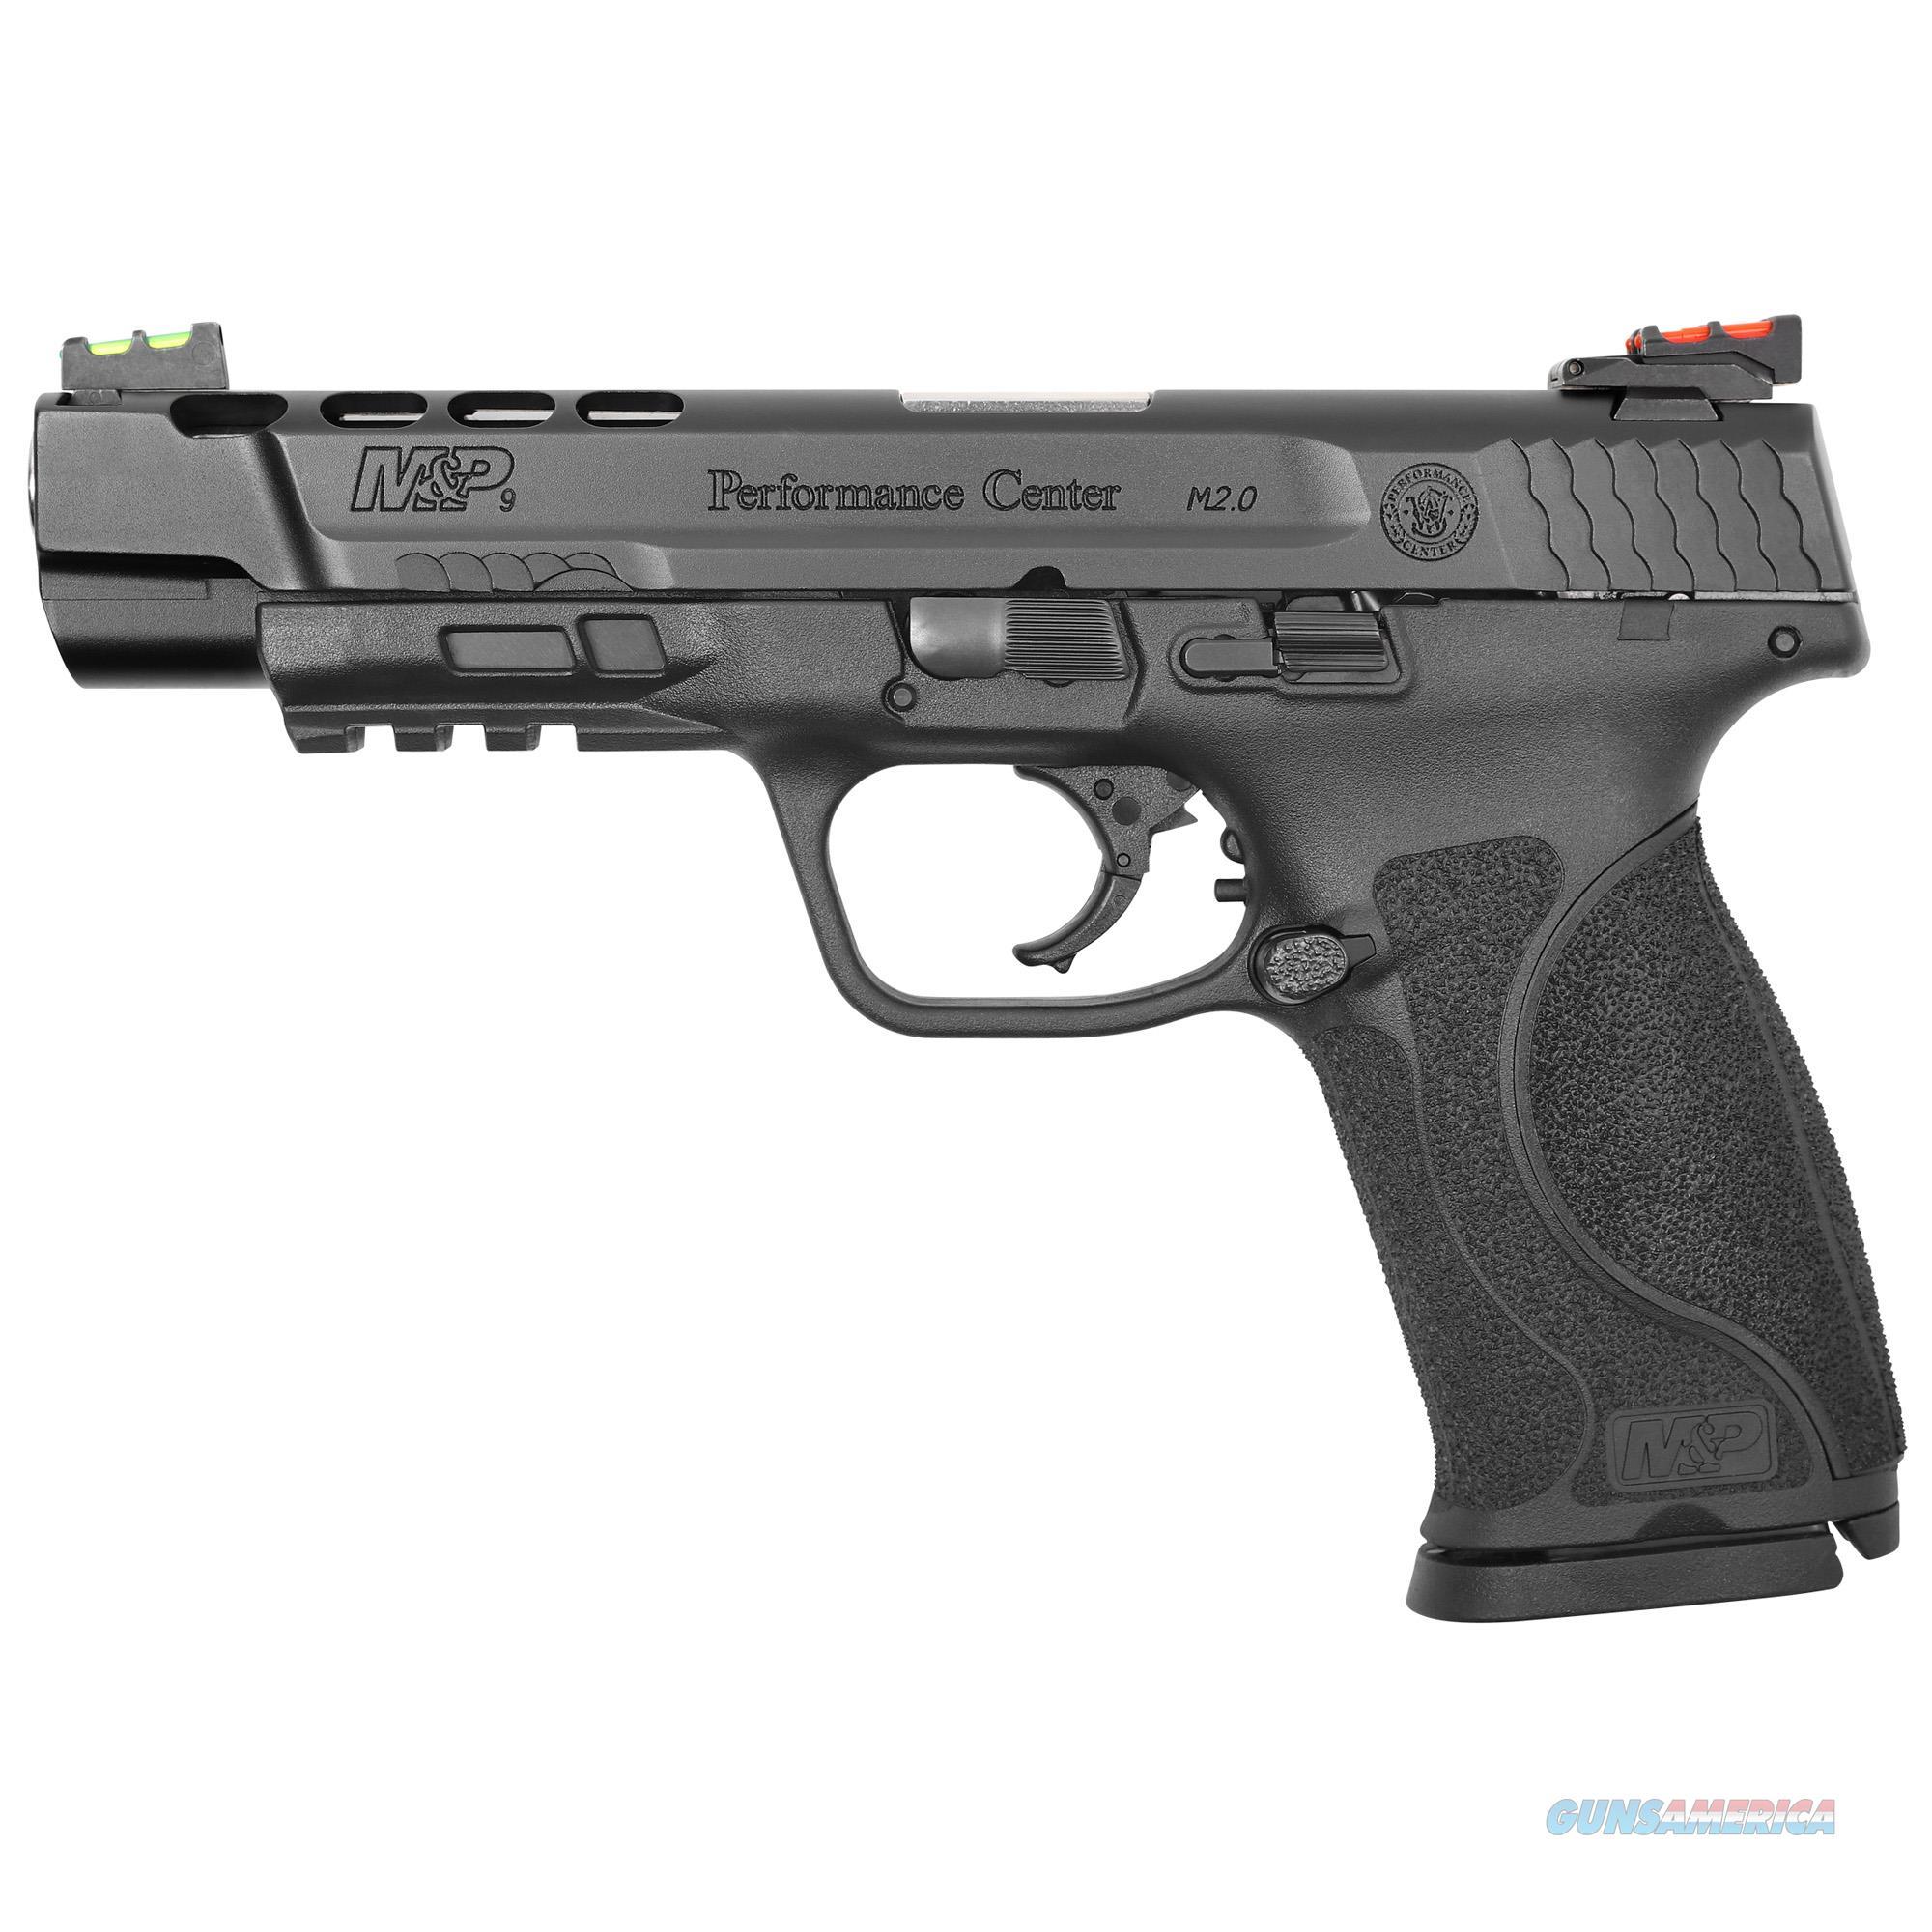 Smith & Wesson M&p 9, S&w M&p9      11824 Pfmc  9m 5in  2.0 Nts Nms Pt  Guns > Pistols > 1911 Pistol Copies (non-Colt)